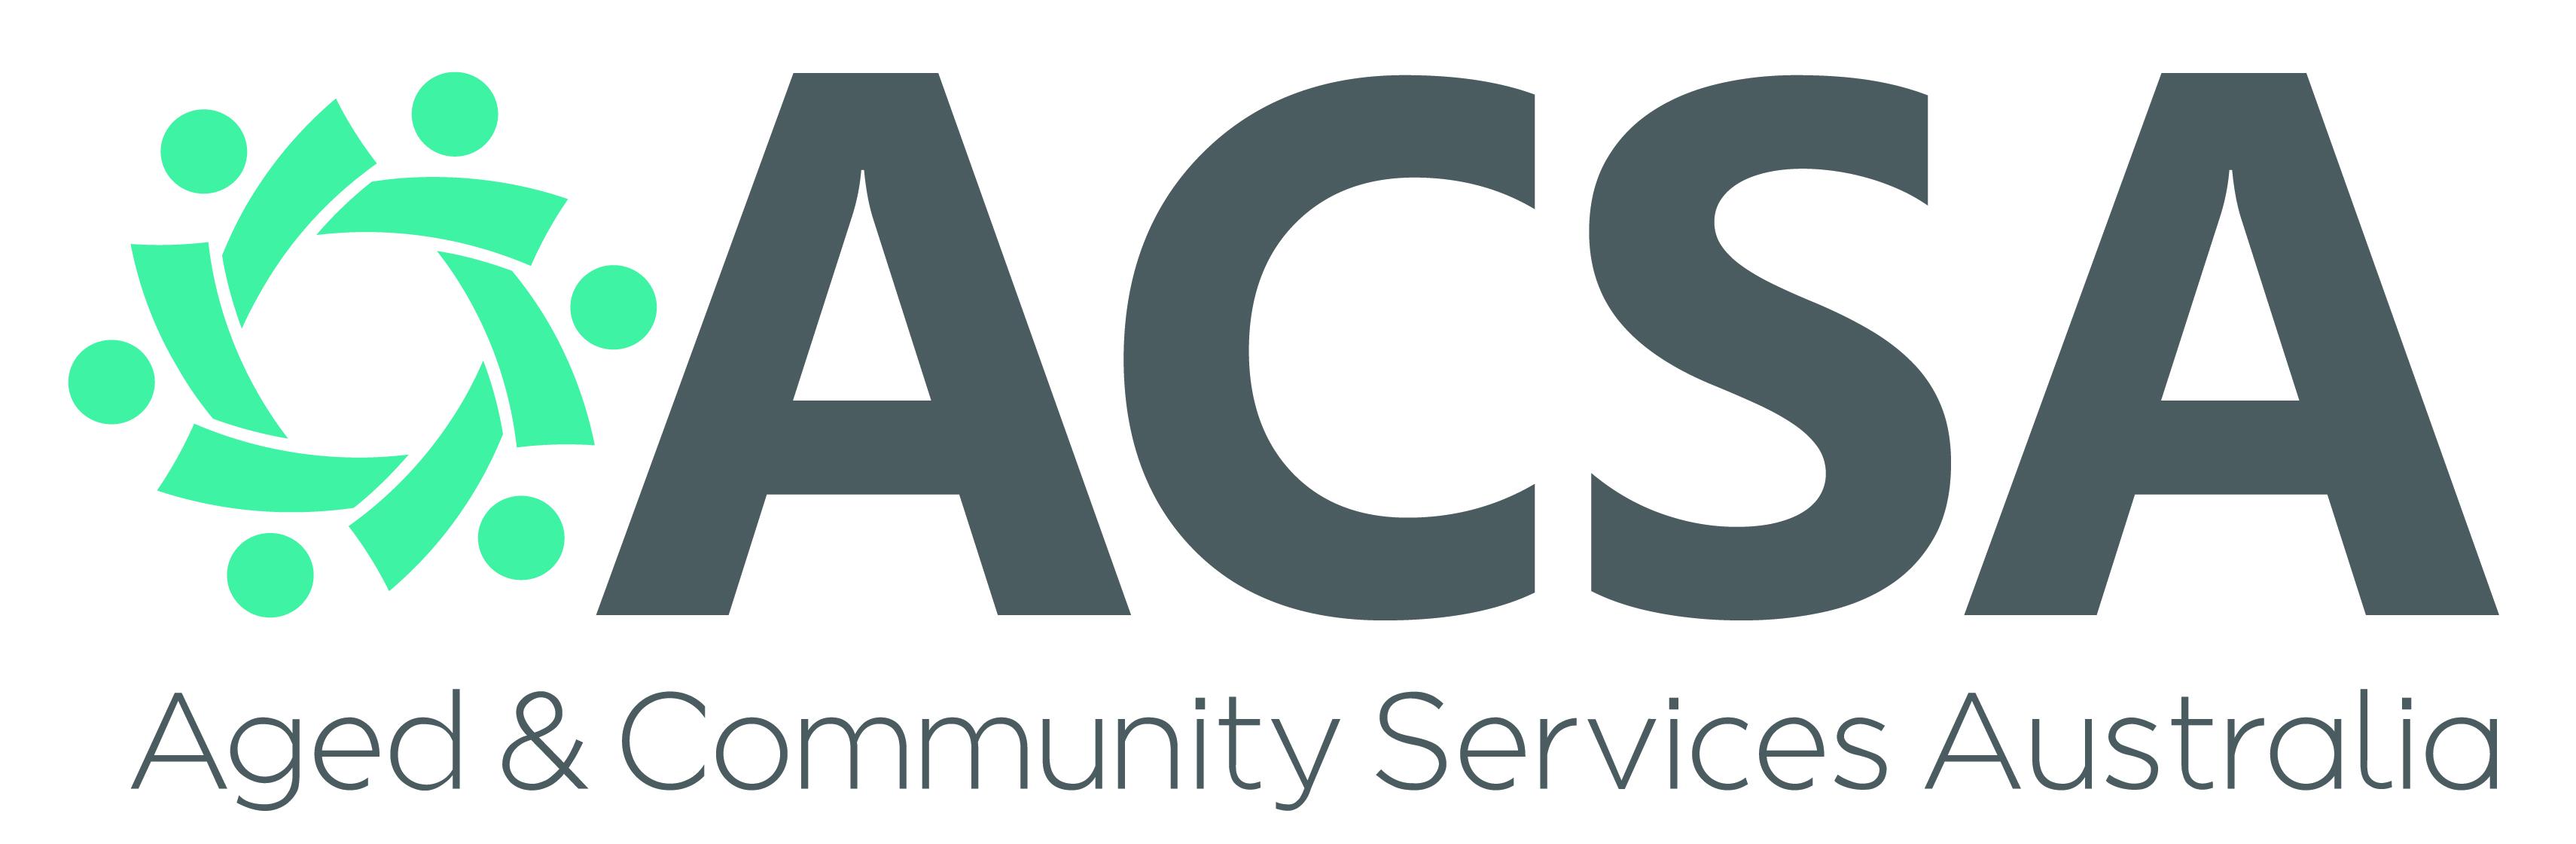 ACSA_logo_full_colour_CMYK.jpg